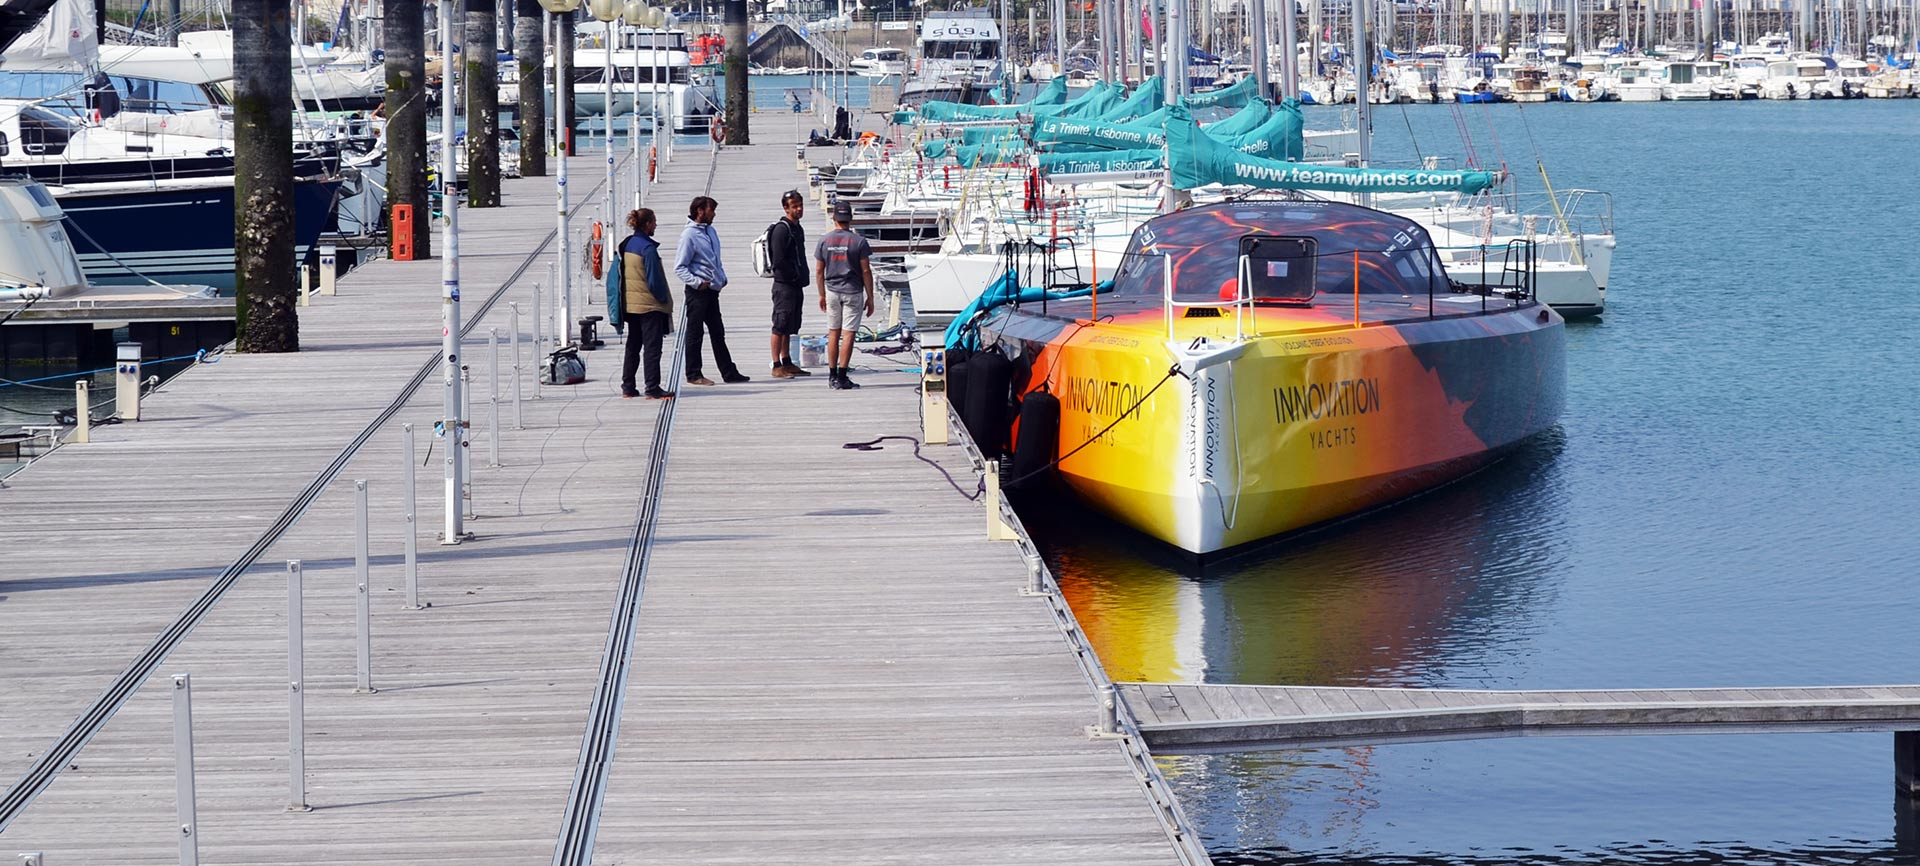 Картинки по запросу Innovation Yachts Open 60 AAL